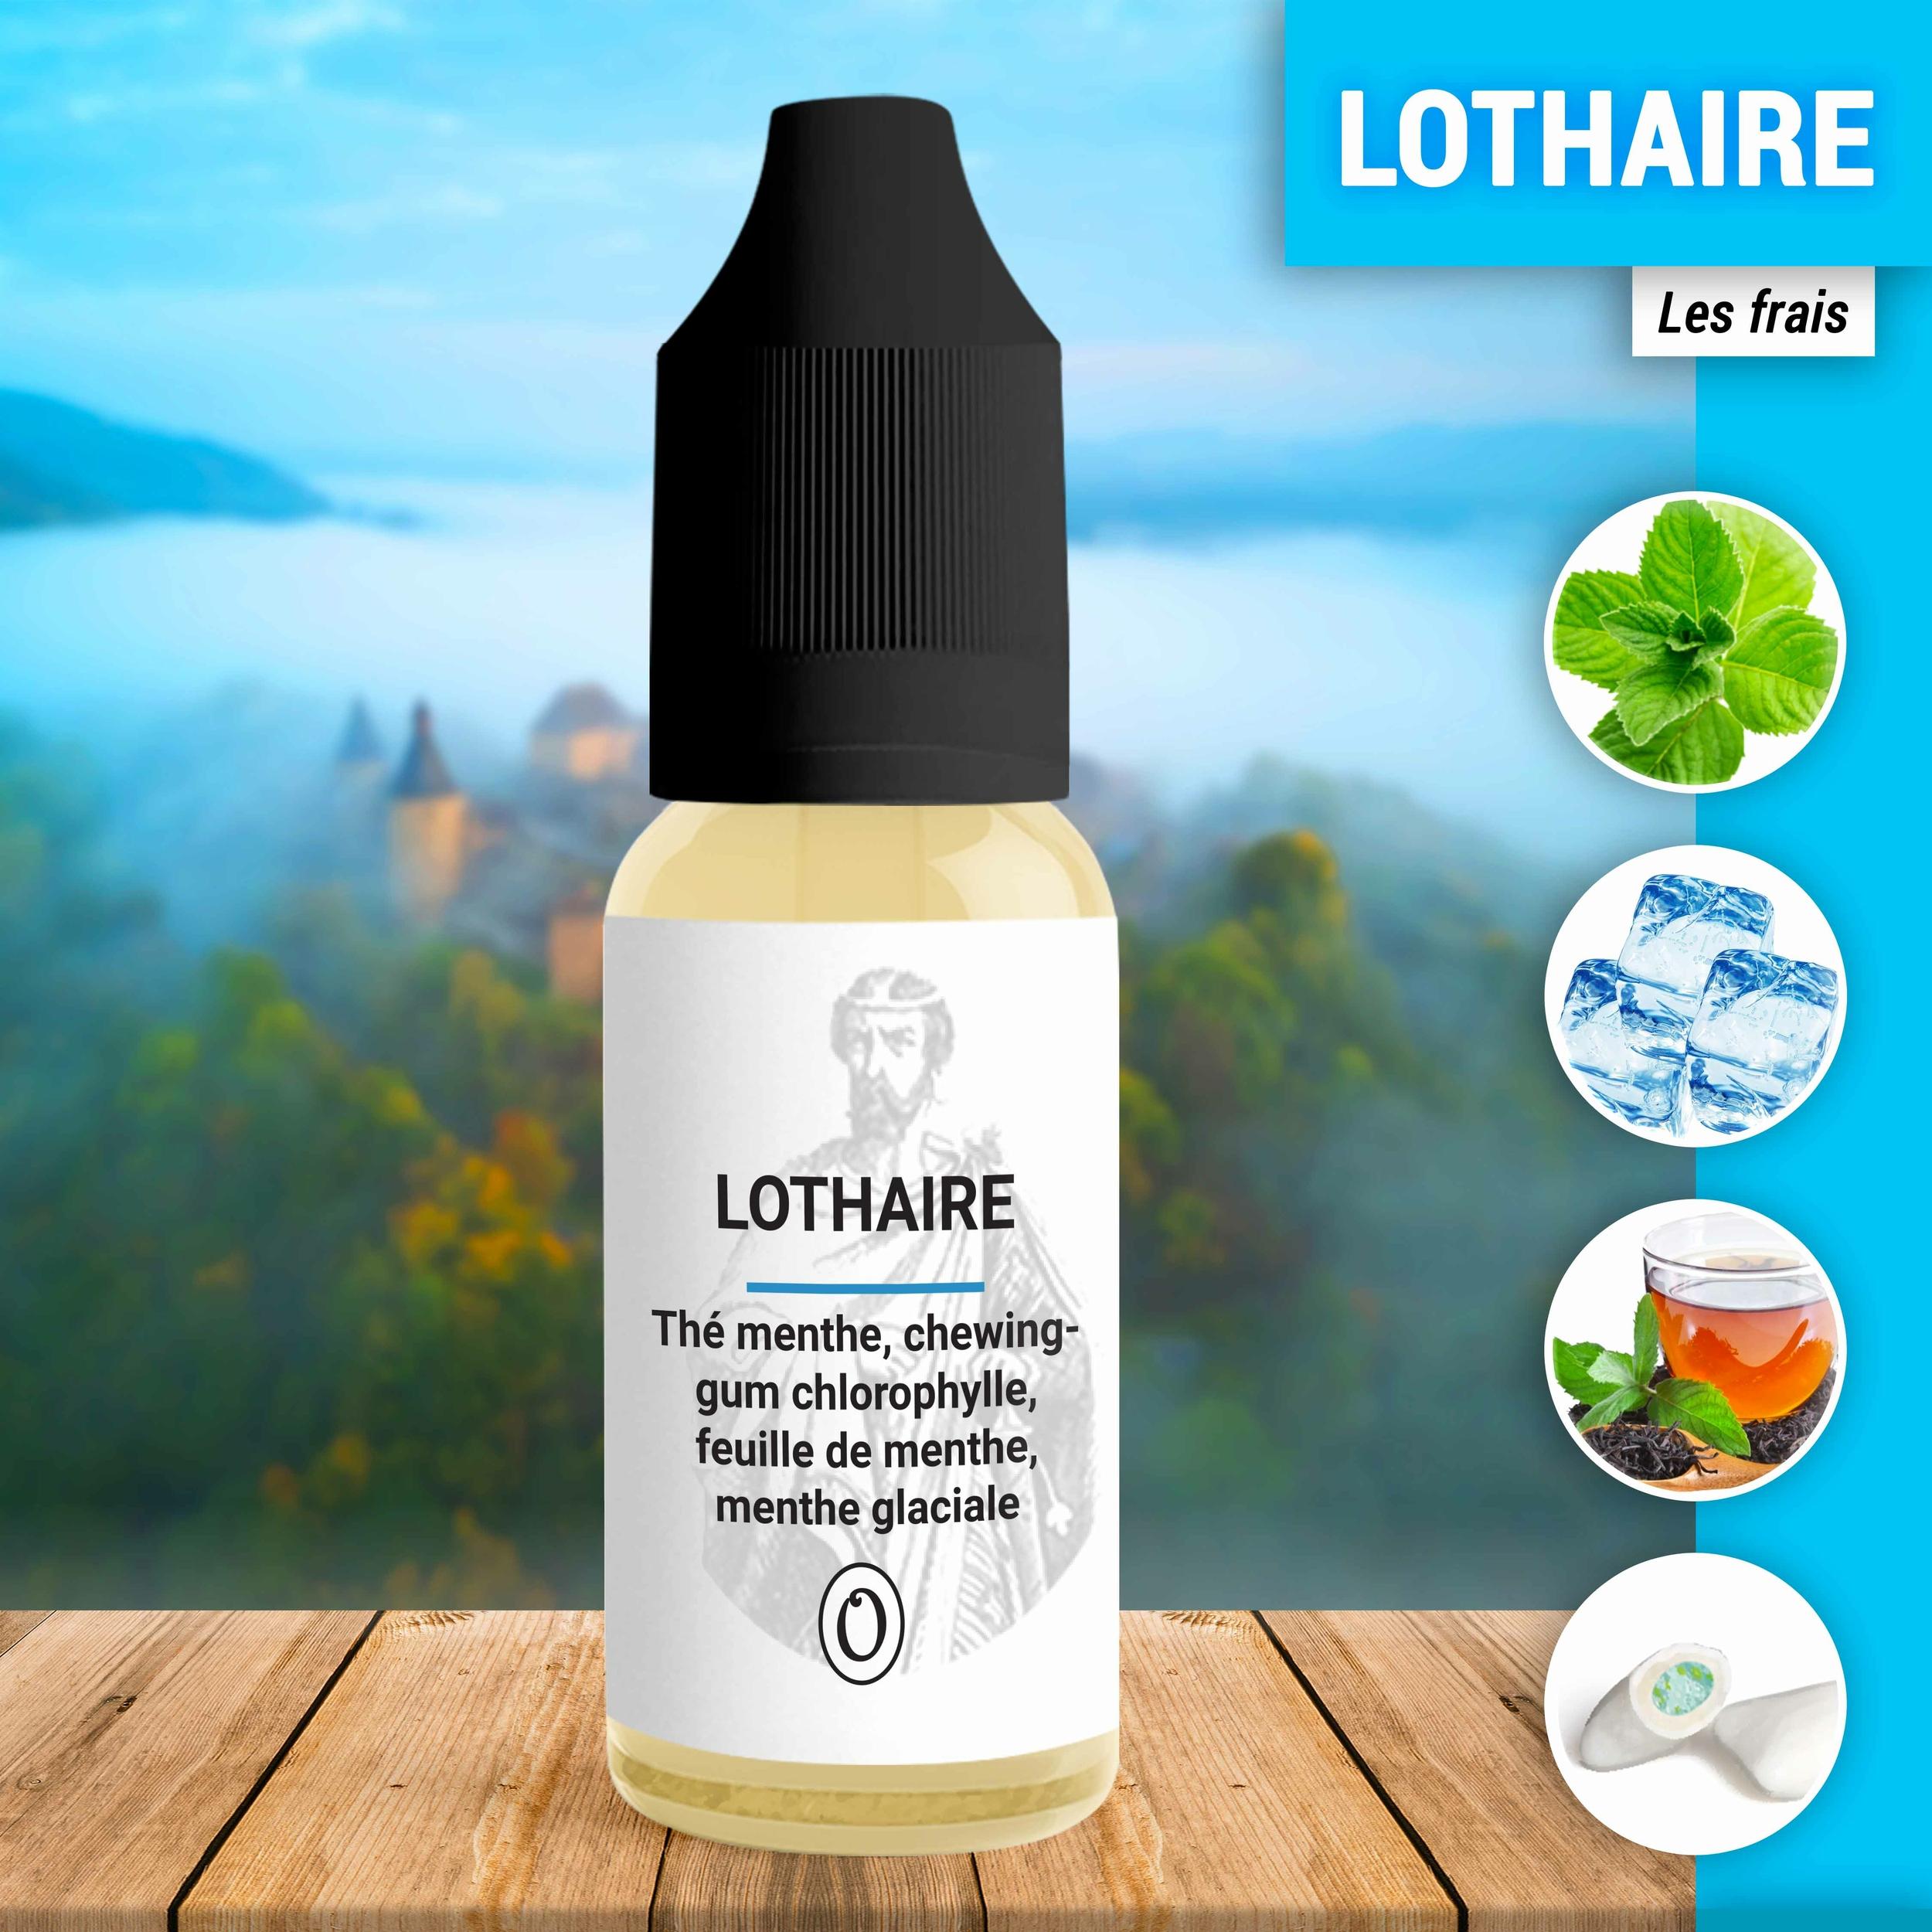 E-liquide Lothaire 10ml